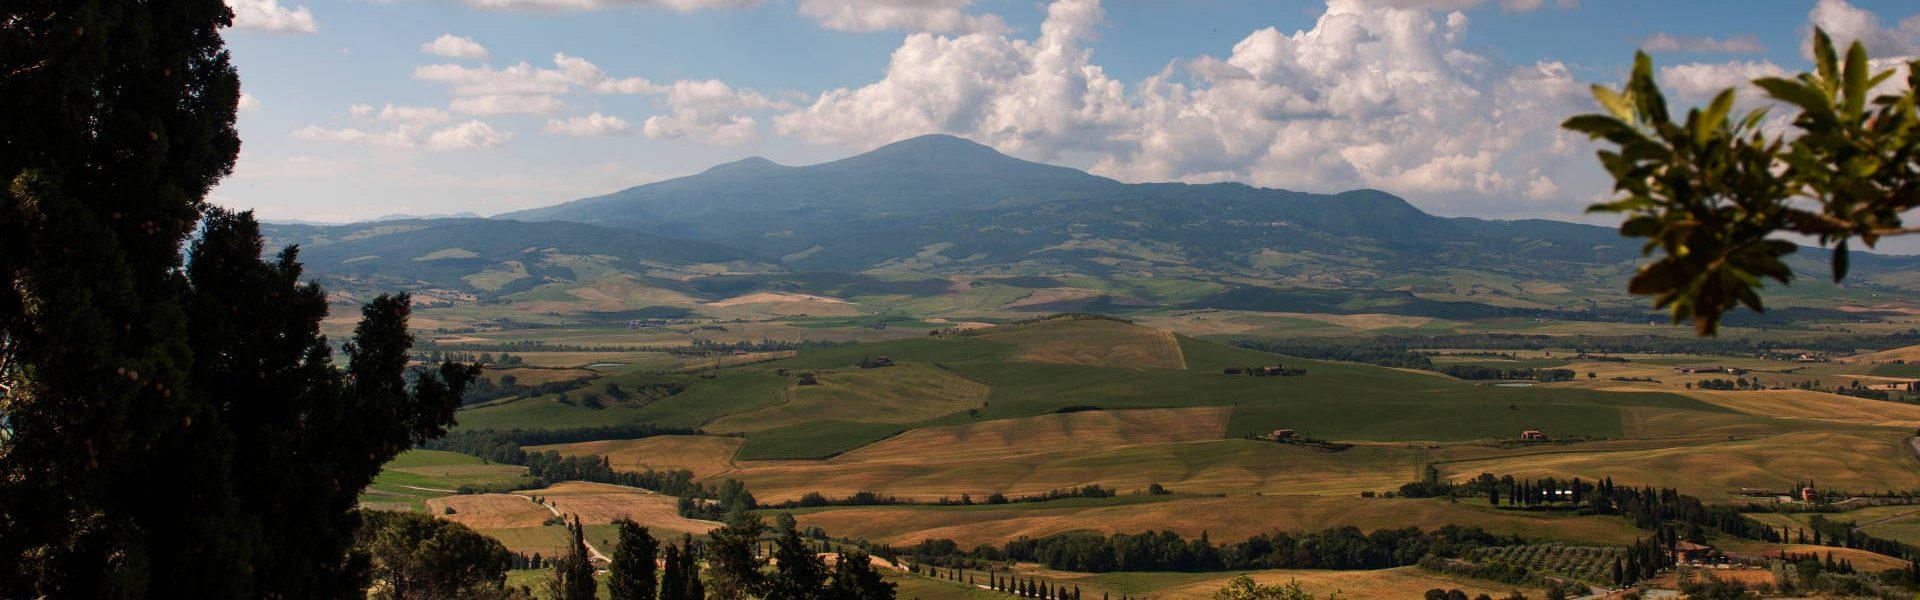 Monte Amiata Panorama